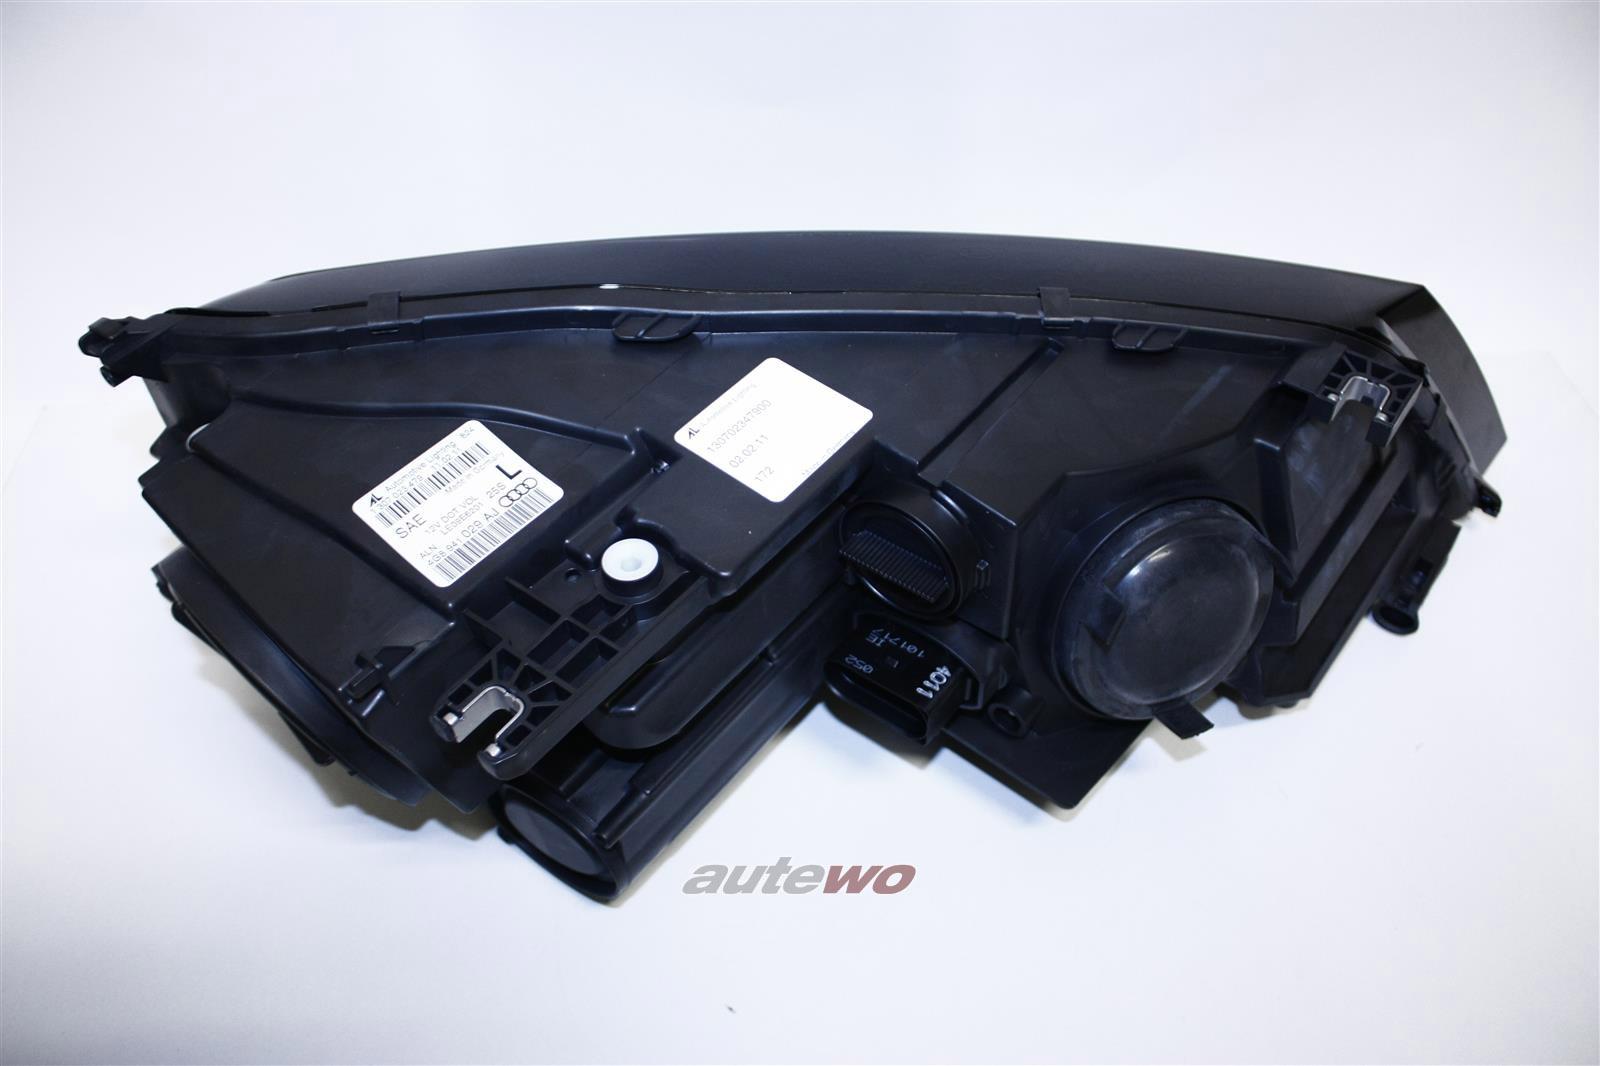 4G8941753B NEU&ORIGINAL Audi A7/RS7 Bi-Xenon Scheinwerfer US-Version Links